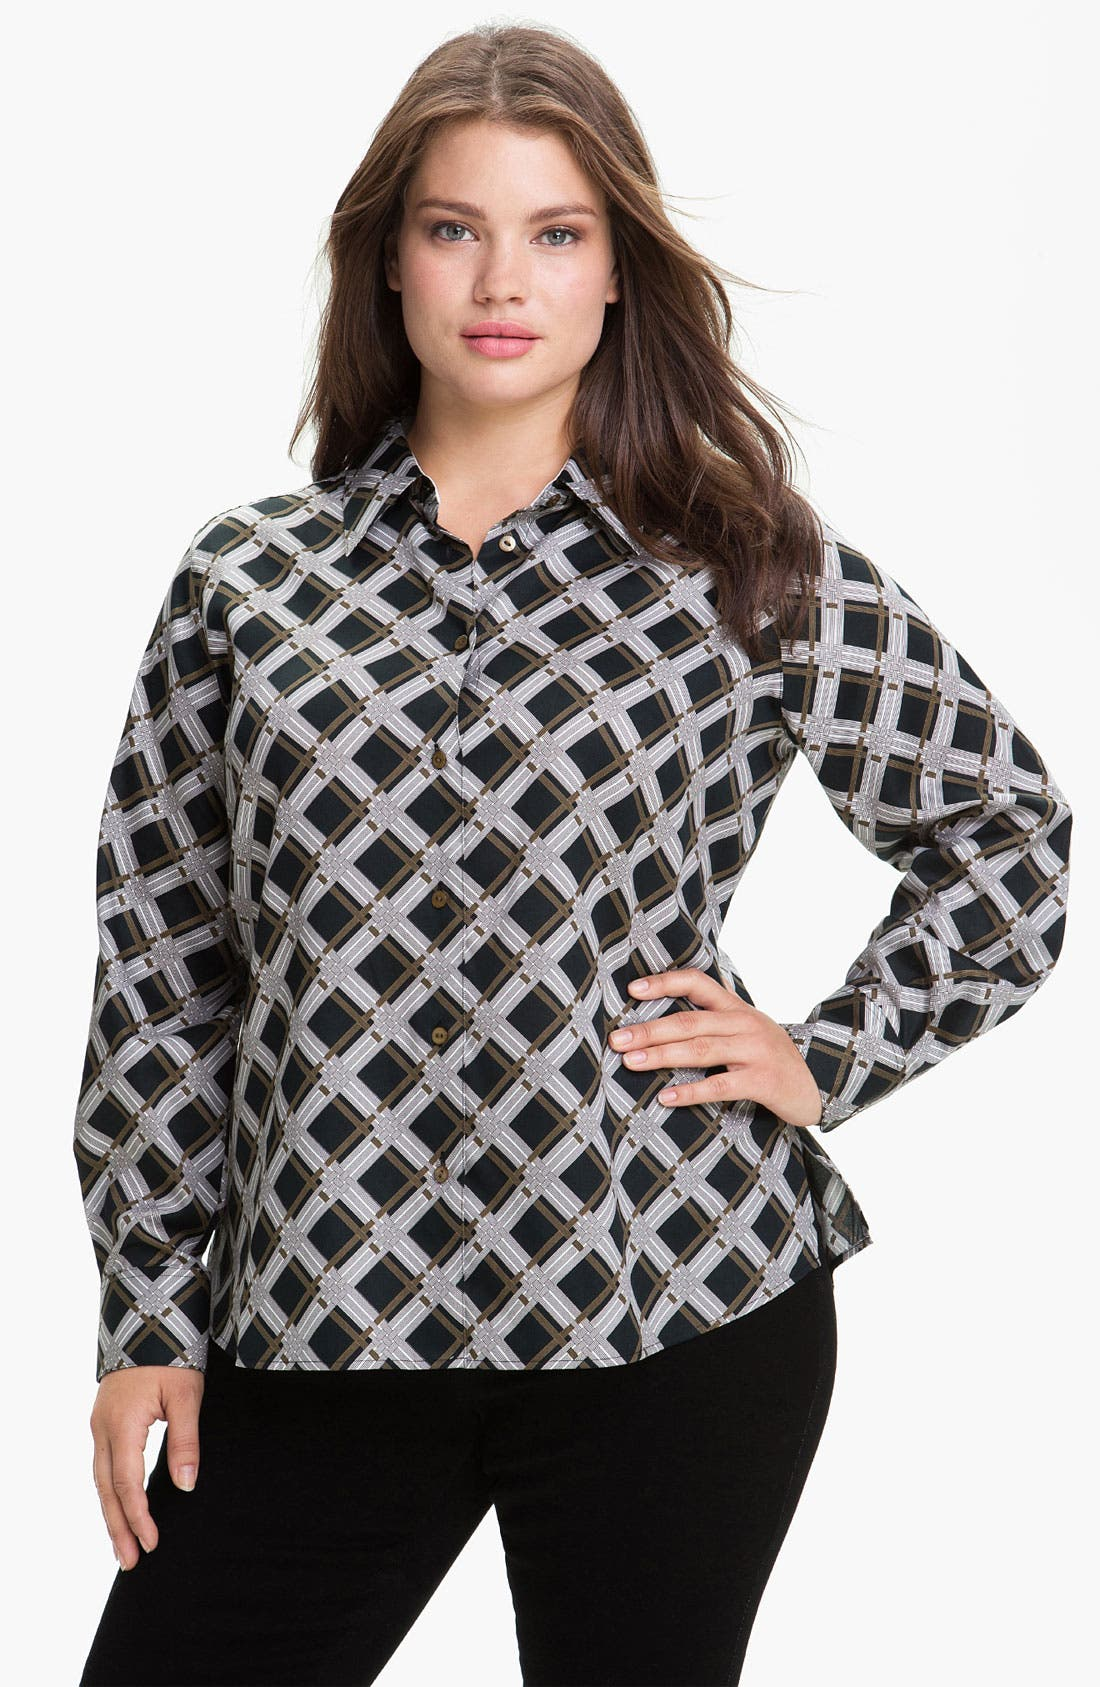 Alternate Image 1 Selected - Foxcroft 'Graphic Plaid' Wrinkle Free Shaped Shirt (Plus)